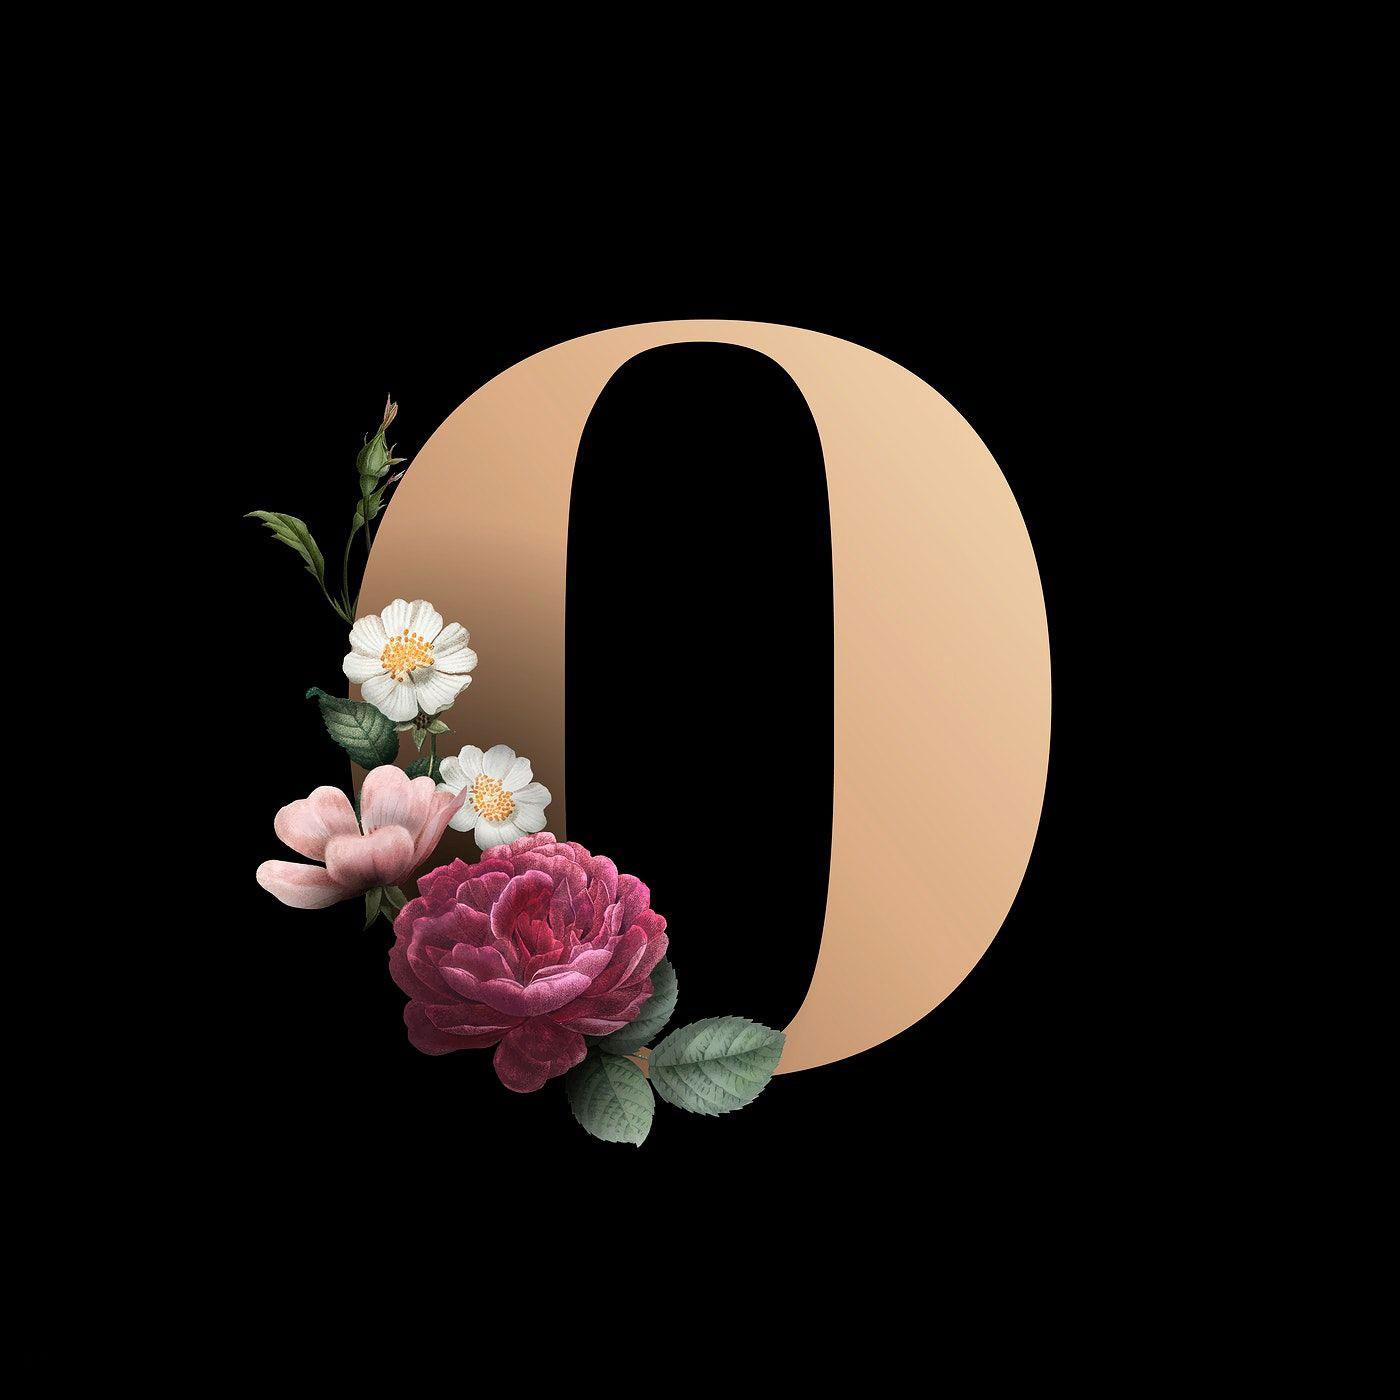 Alphabet Dp Images download